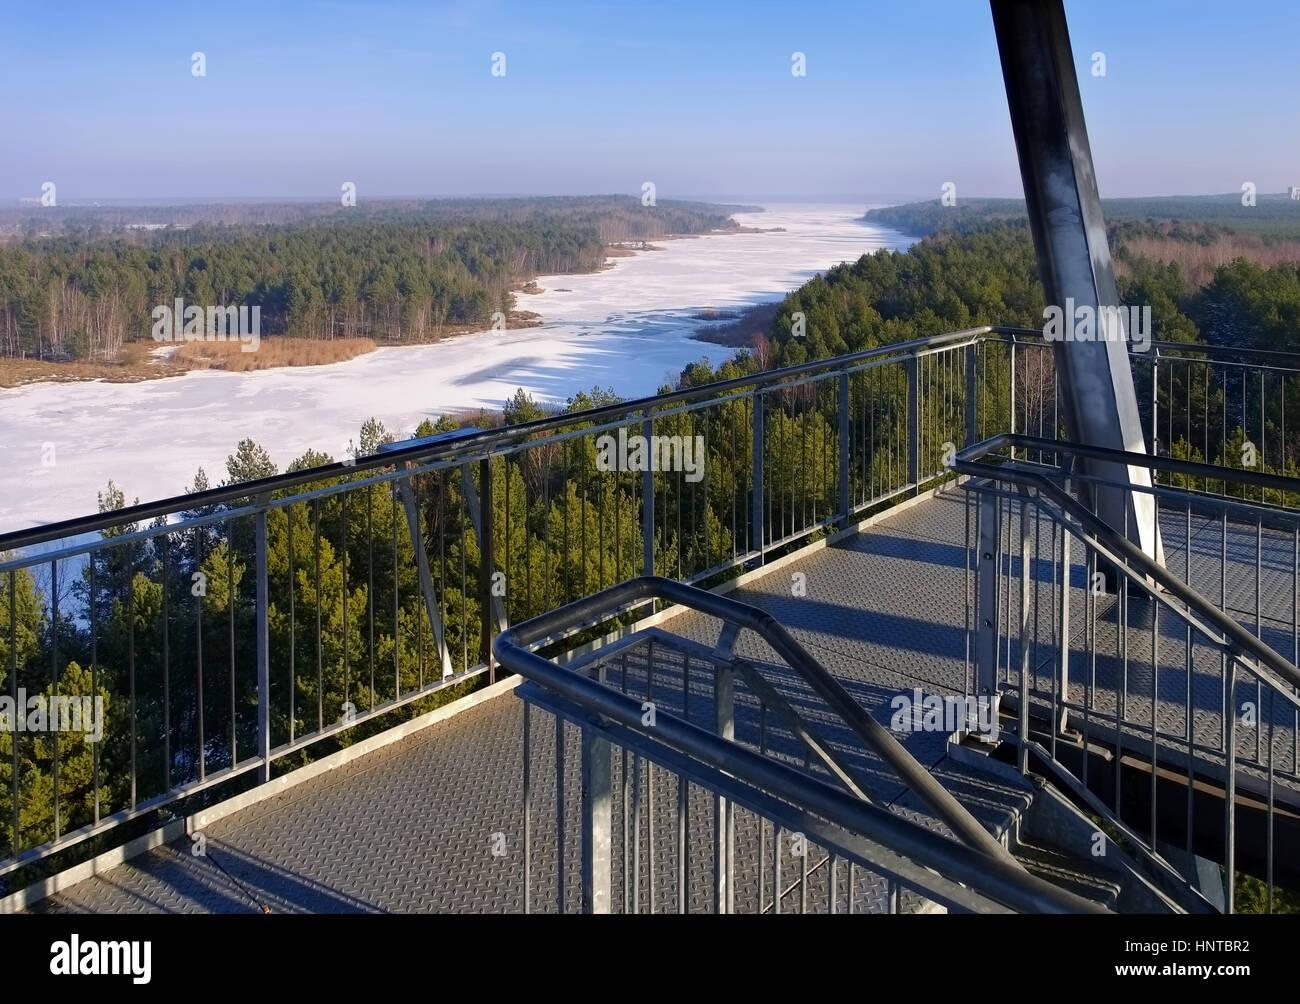 Senftenberger sehen Aussichtsturm Im Winter - Senftenberger See im Winter Aussichtsturm, Lausitzer Seenland Stockbild